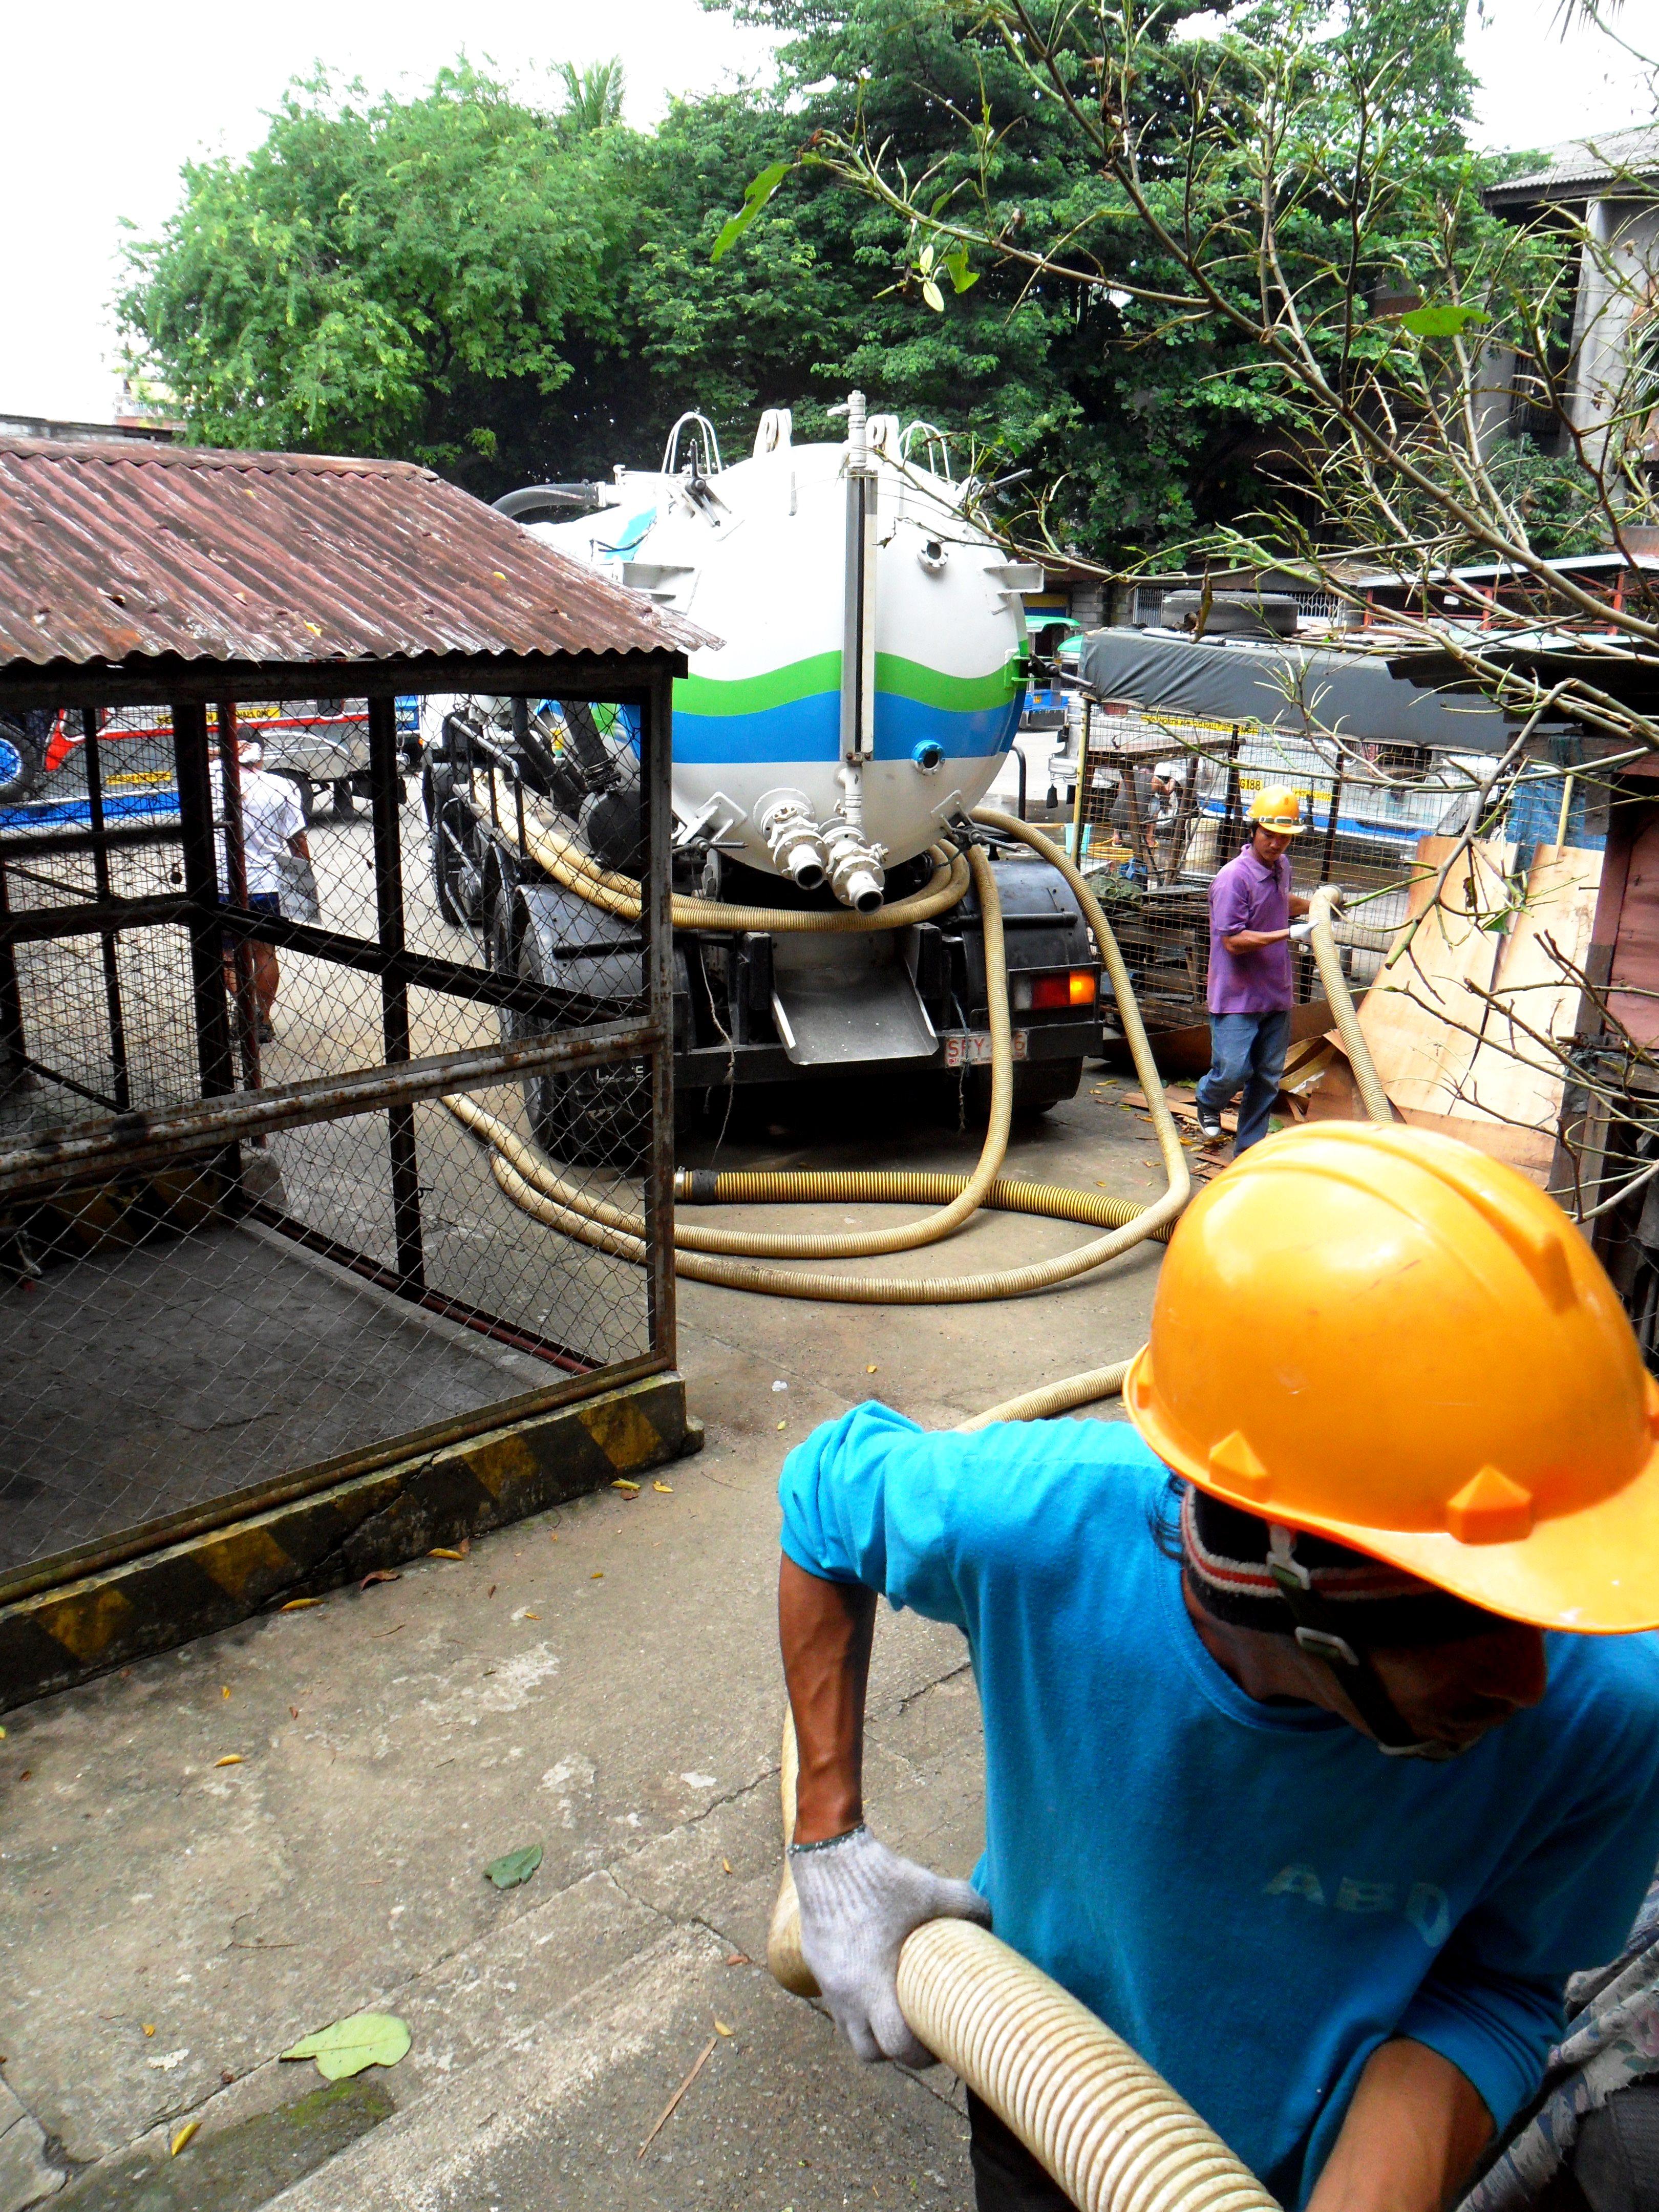 Septic tank desludgers at work in Metro Manila, Philippines. Photo: Julian Doczi/ODI